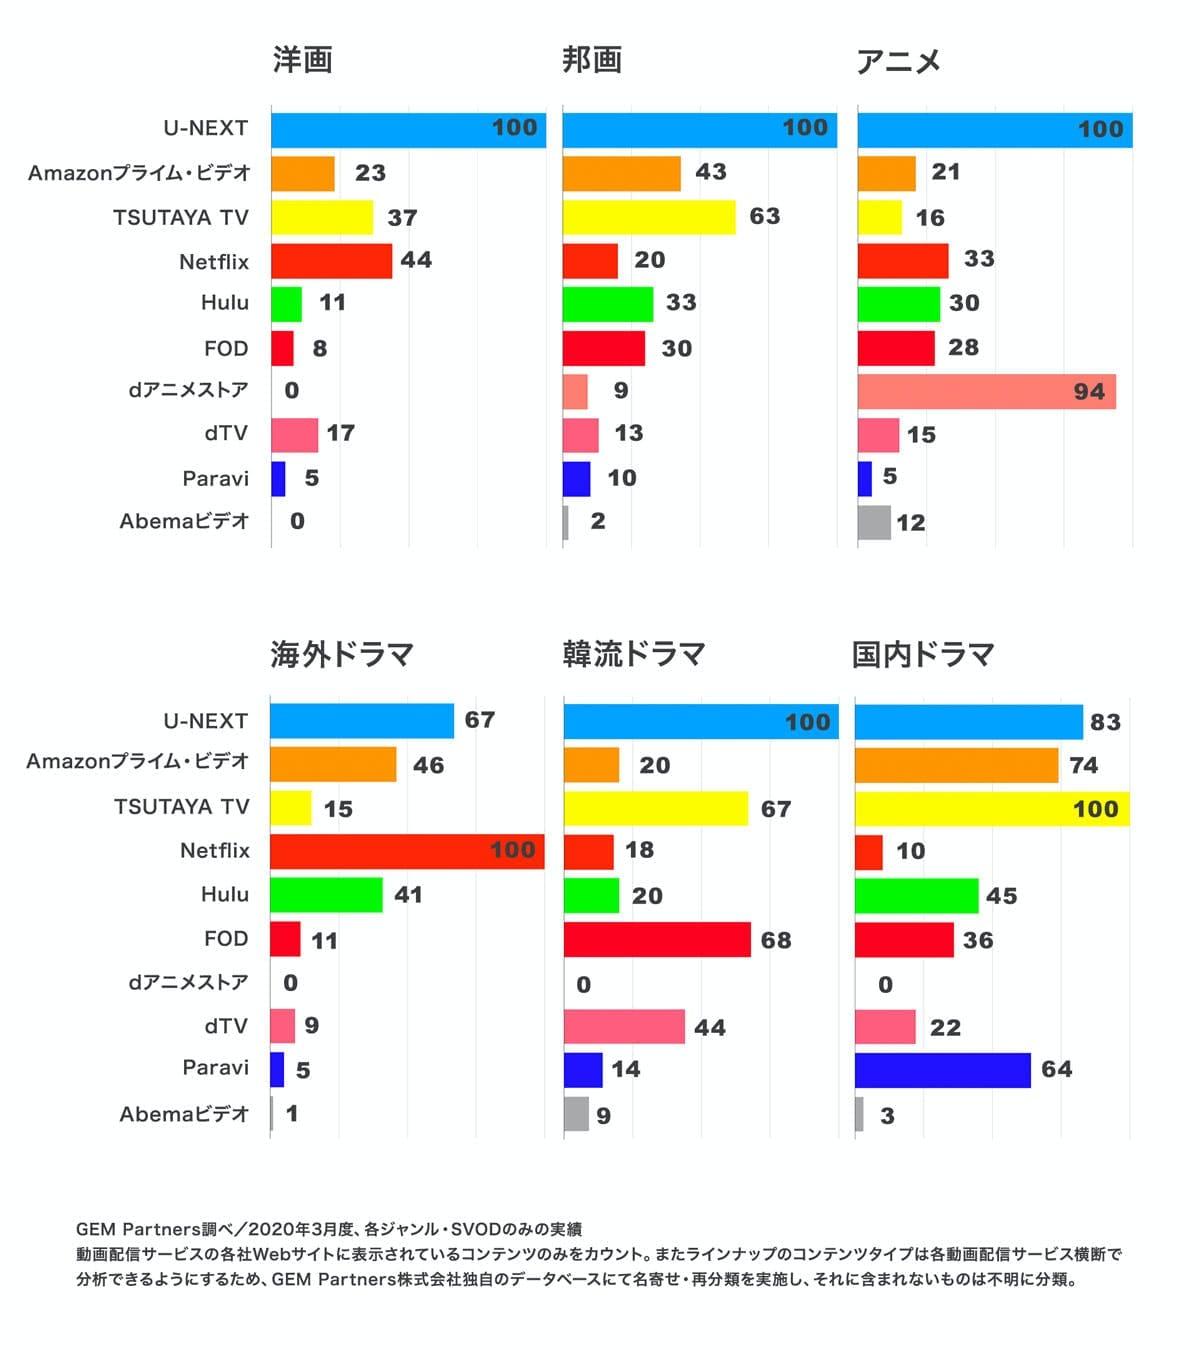 U-NEXTの見放題作品数はNo.1